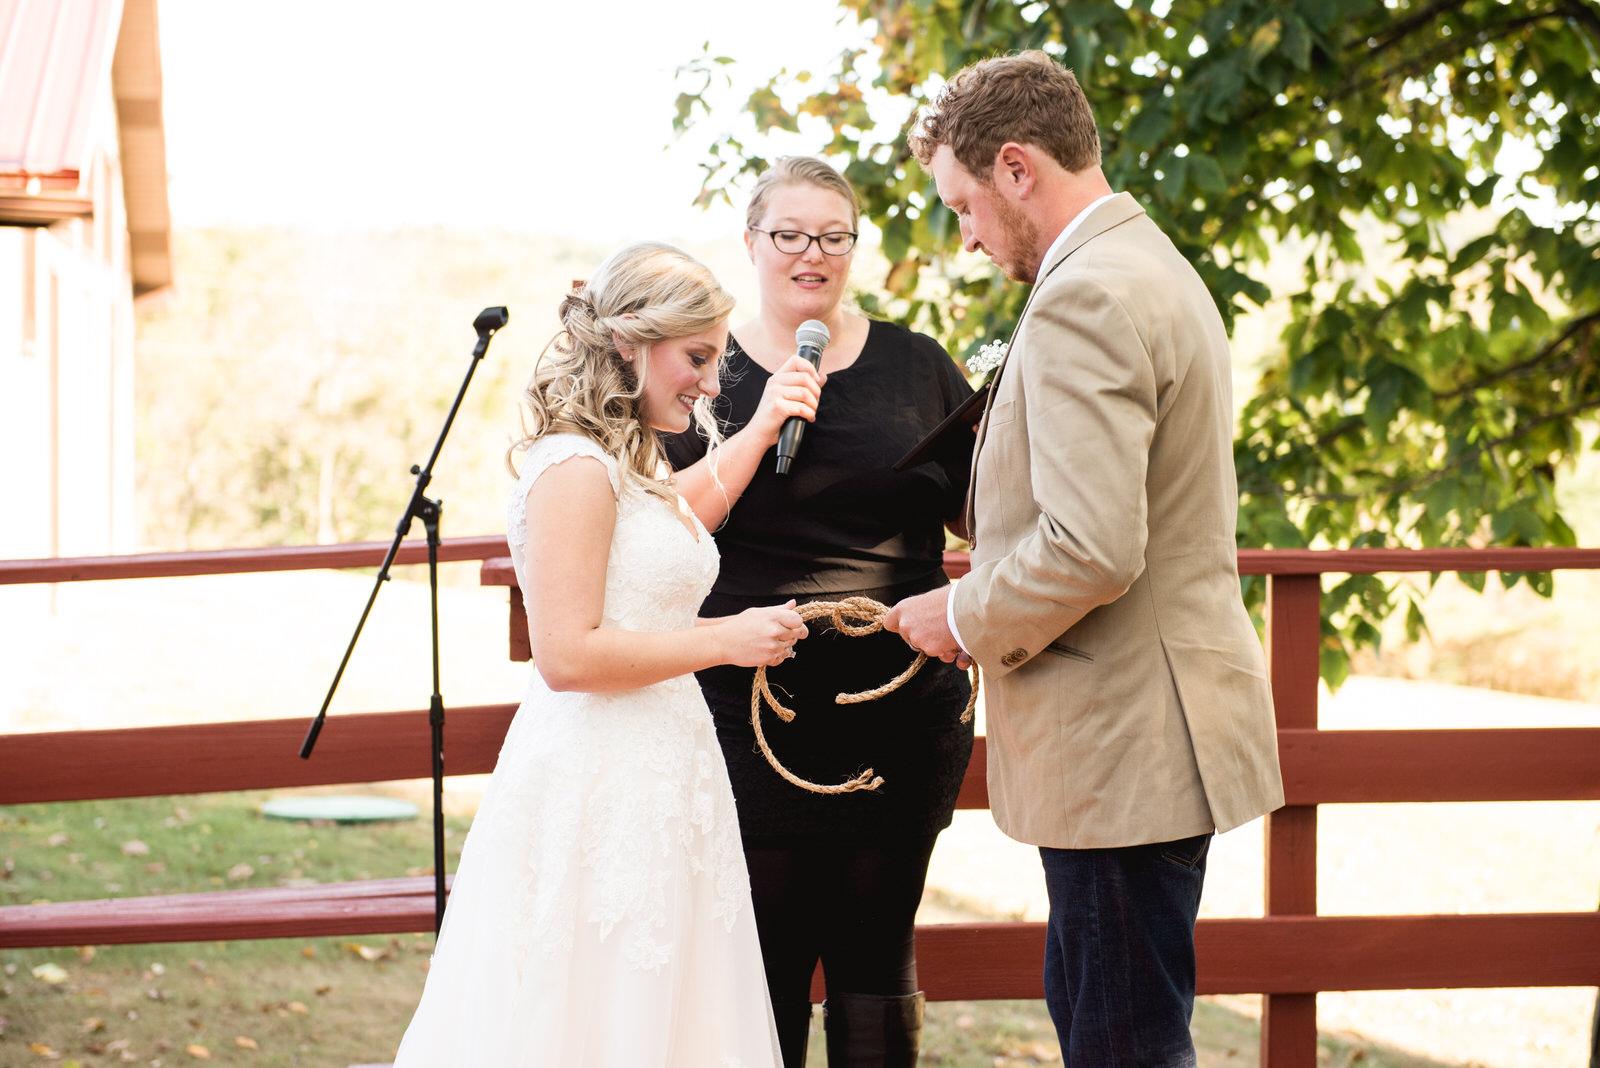 wedding_at_red_fox_winery_wedding_photographer019.jpg